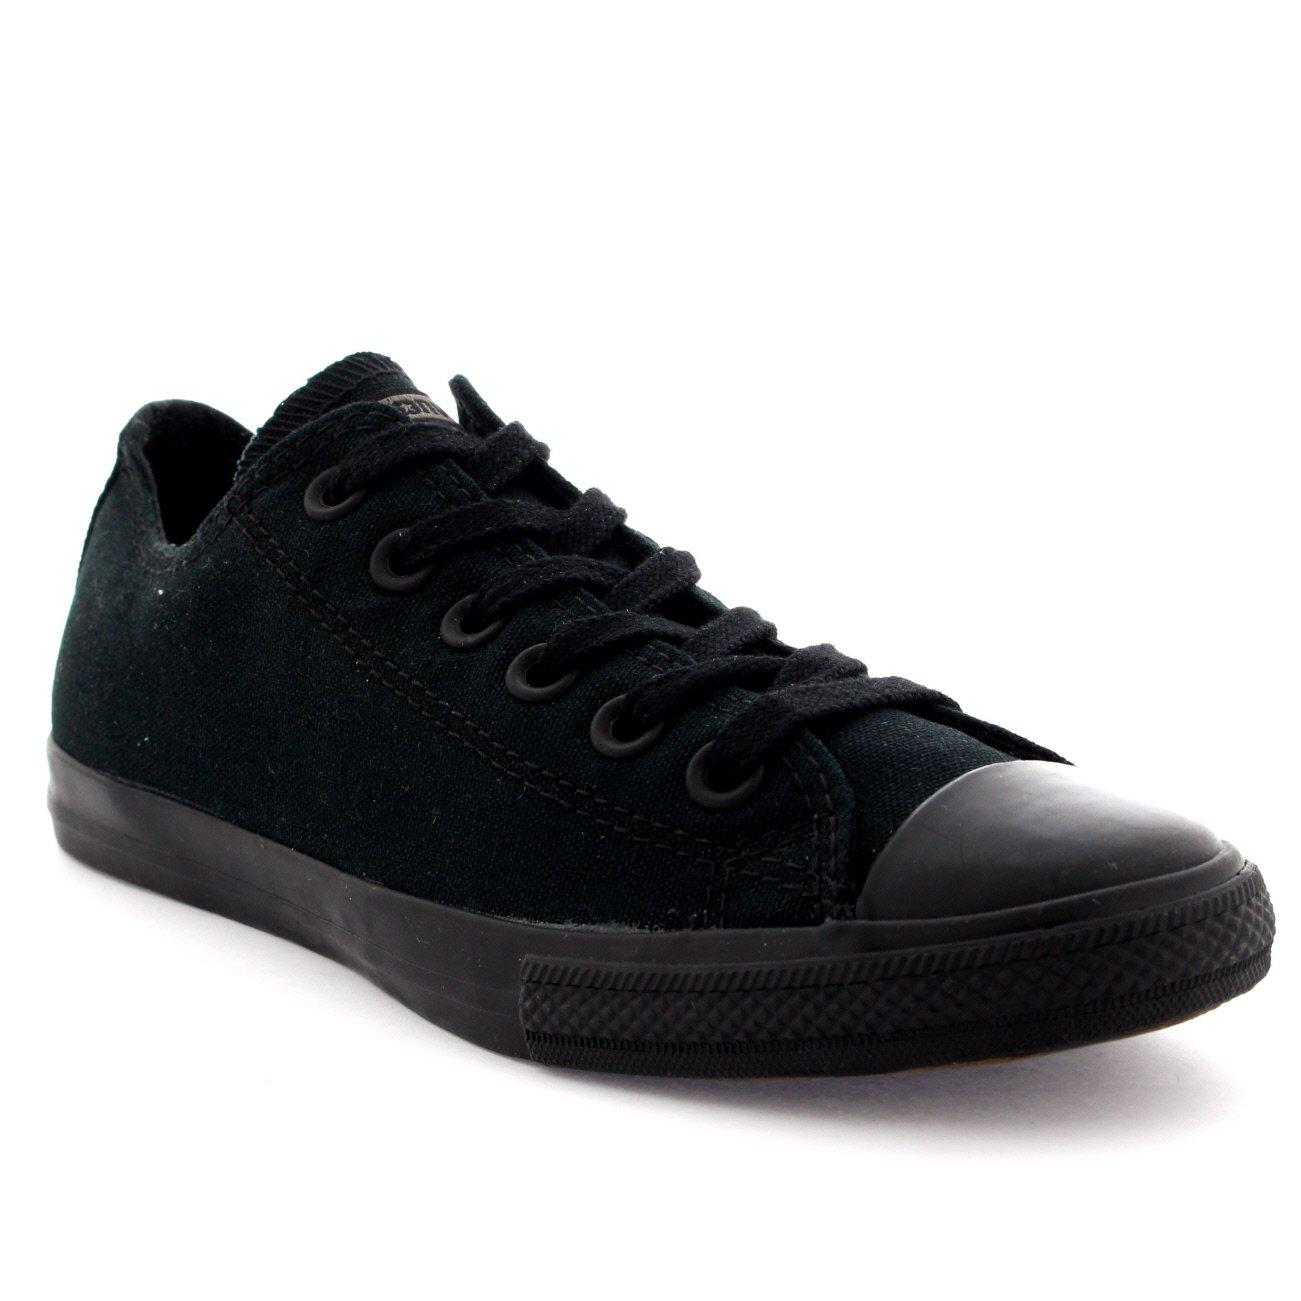 Converse Chuck Taylor All Star Season OX, Unisex Sneaker  36 EU Schwarz/Schwarz